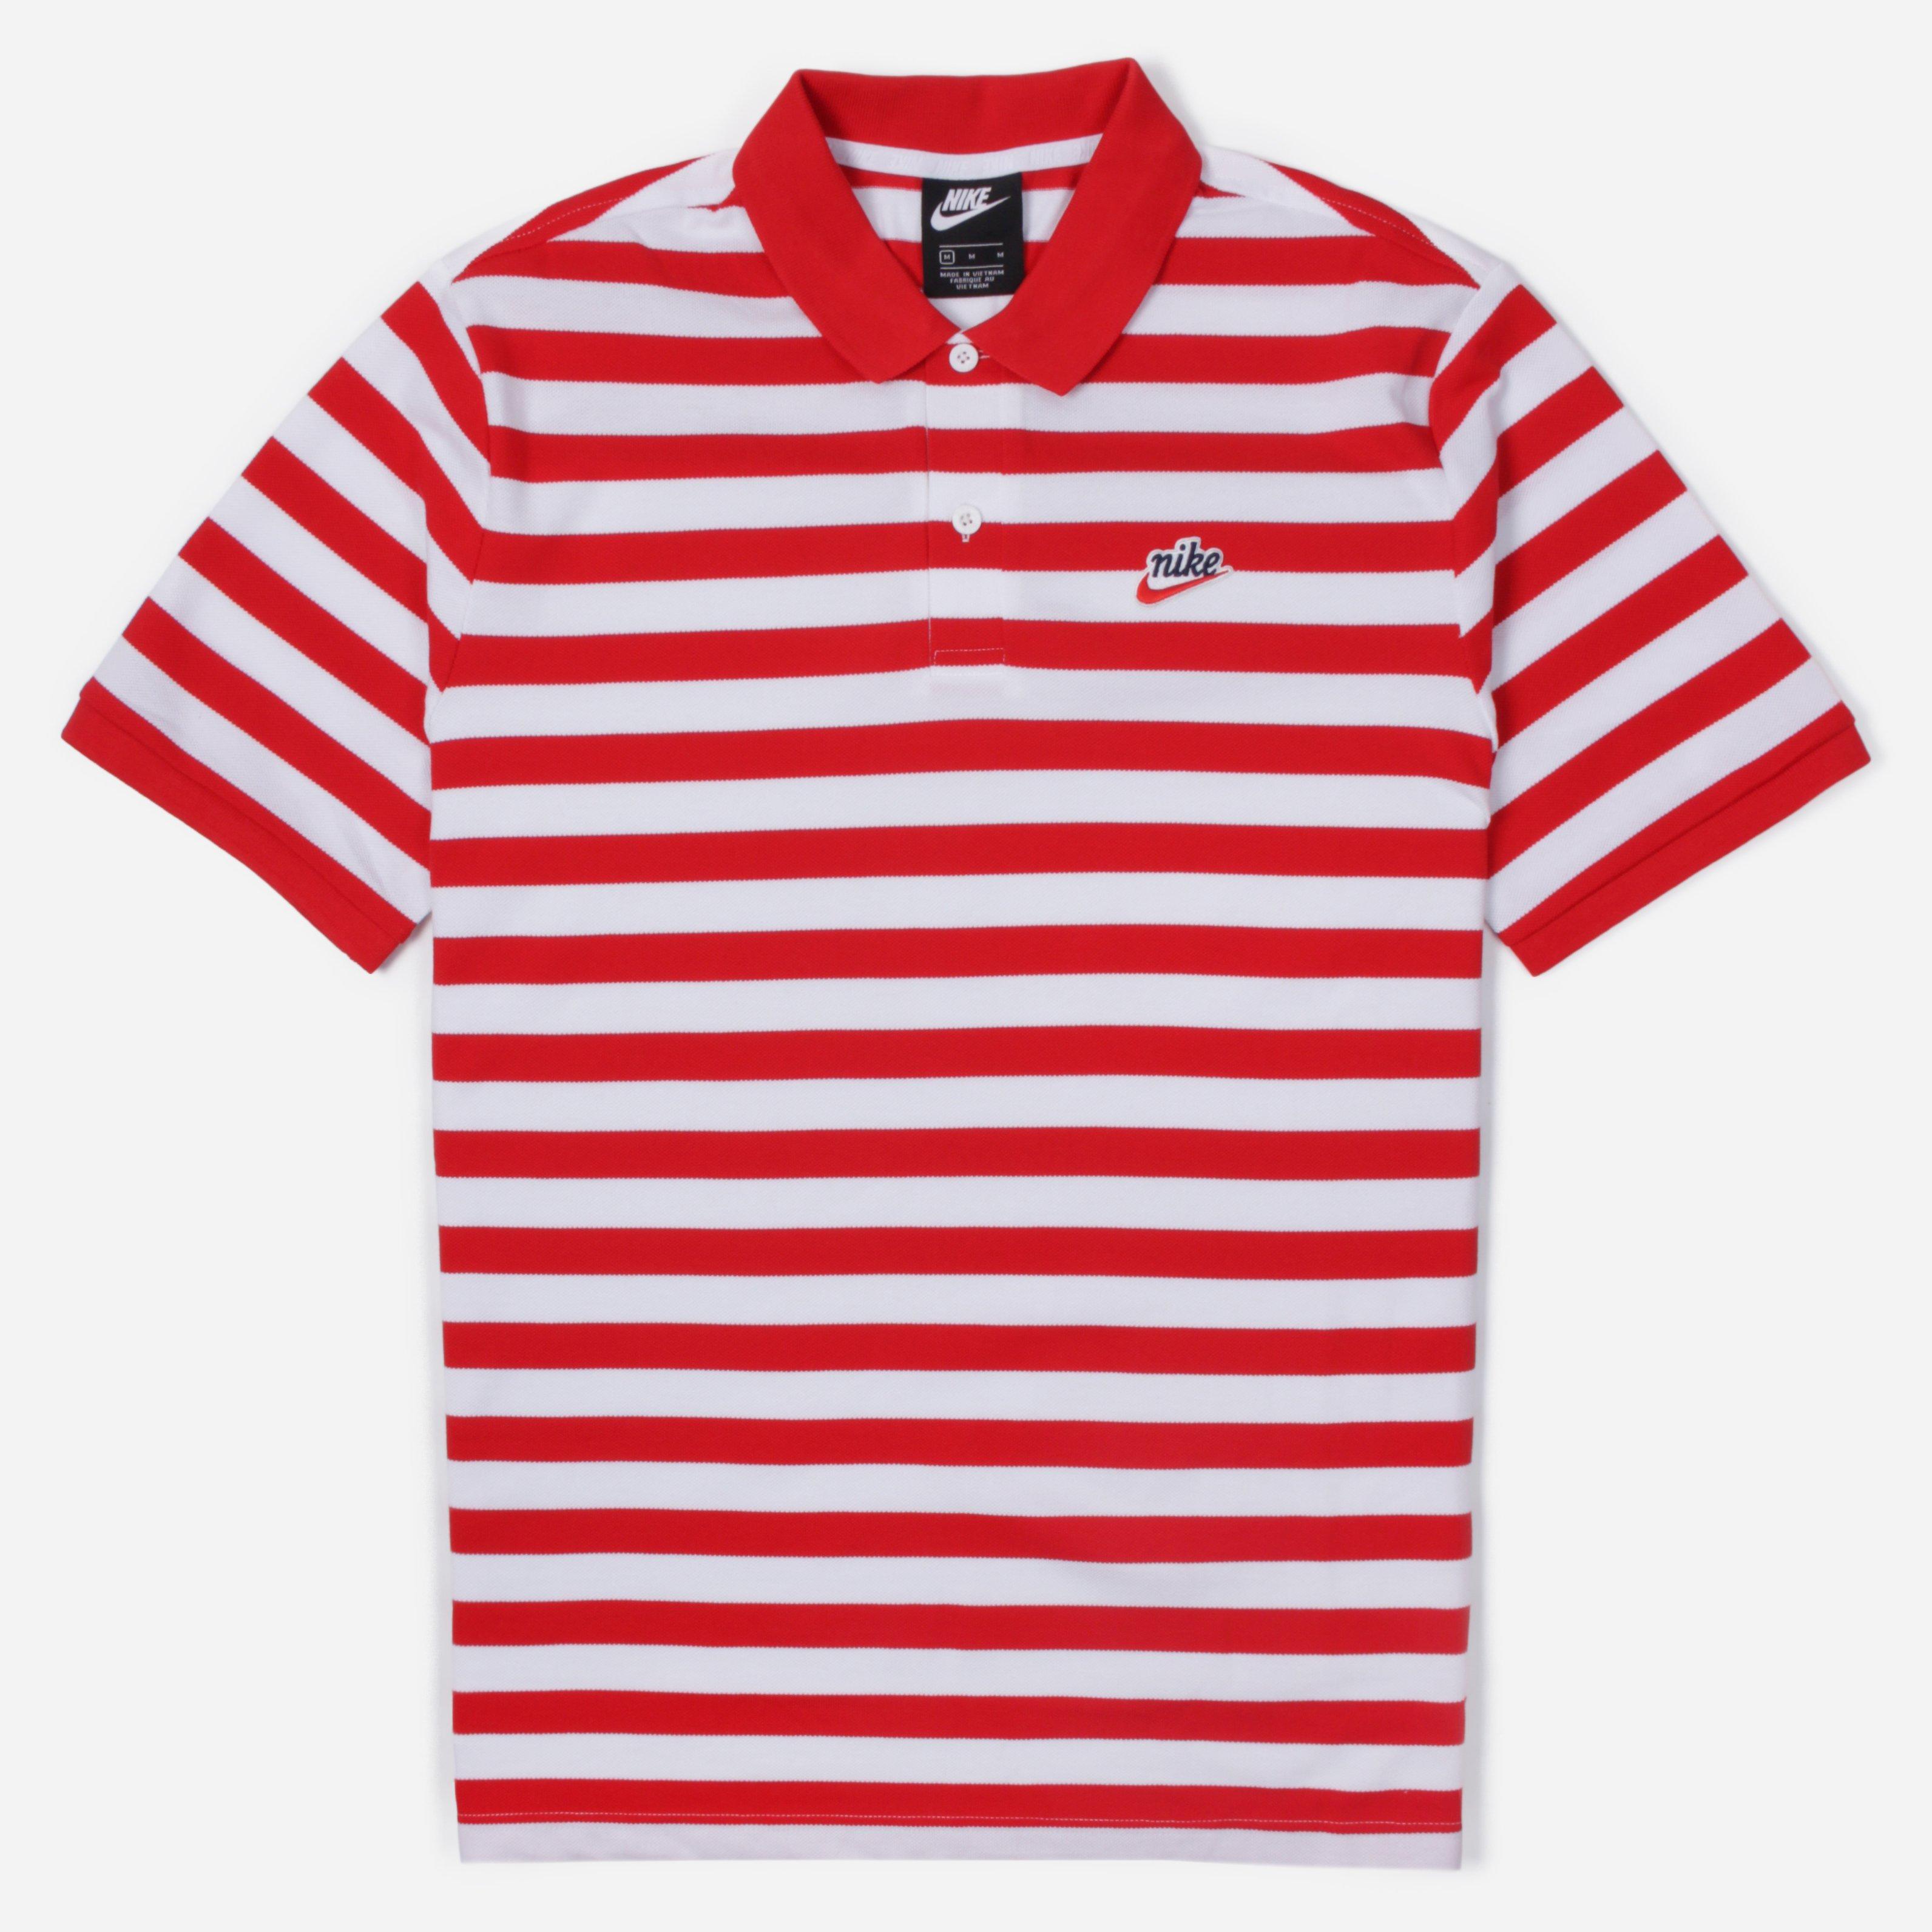 nike red polo shirt